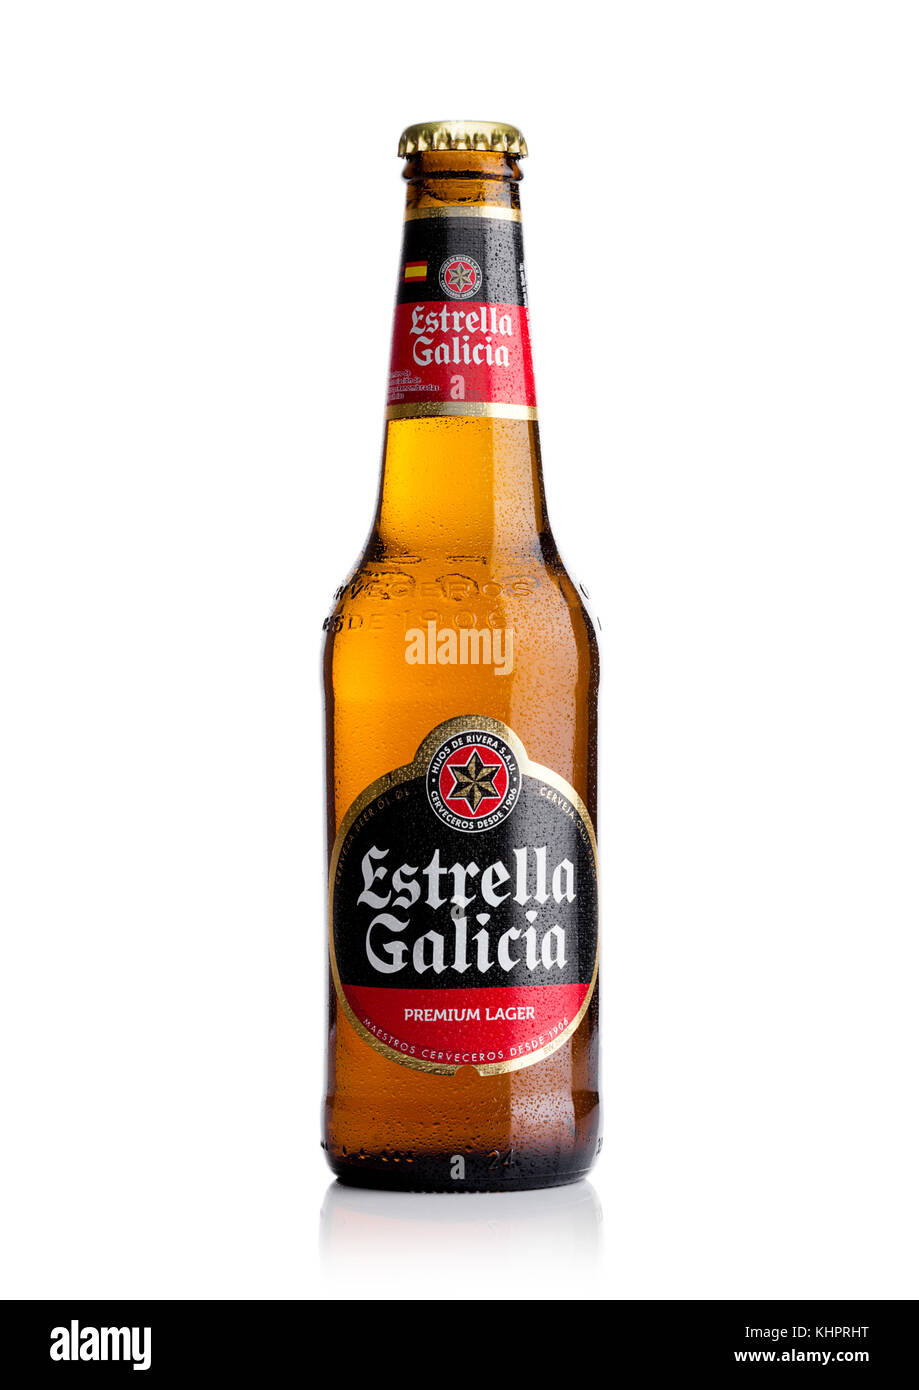 London Uk November 17 Bottle Estrella Galicia Pale Lager Draft Khprht Stock Photos Images Alamy